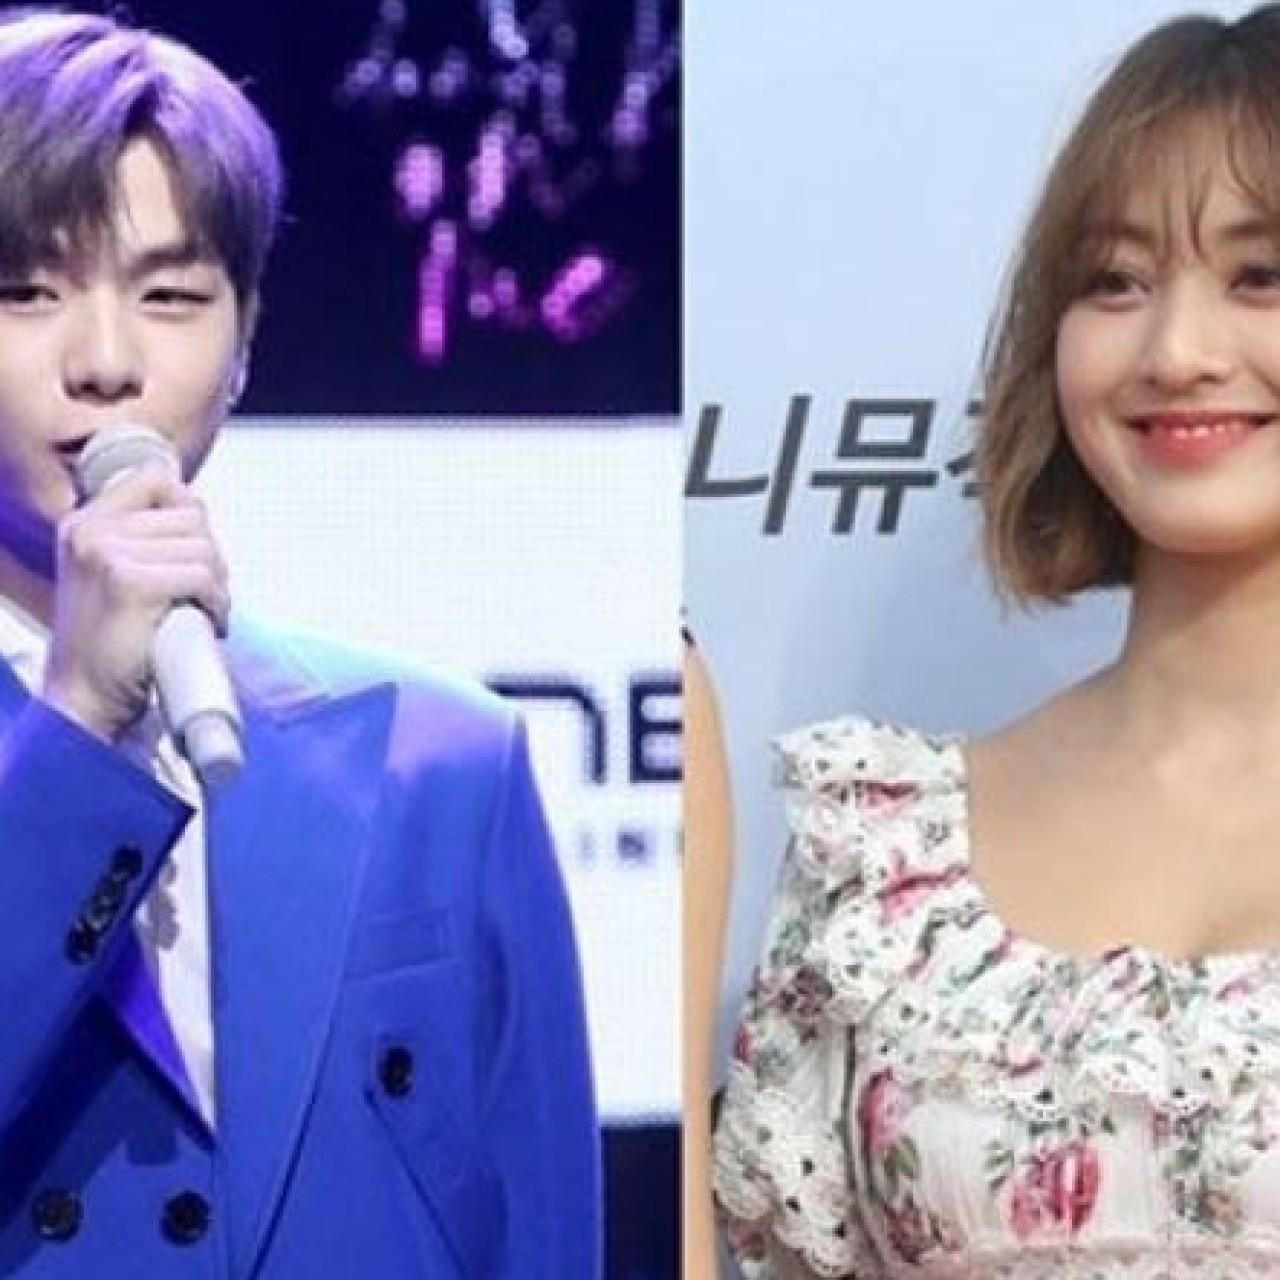 K-pop star Johyun's League of Legends cosplay 'too revealing', say